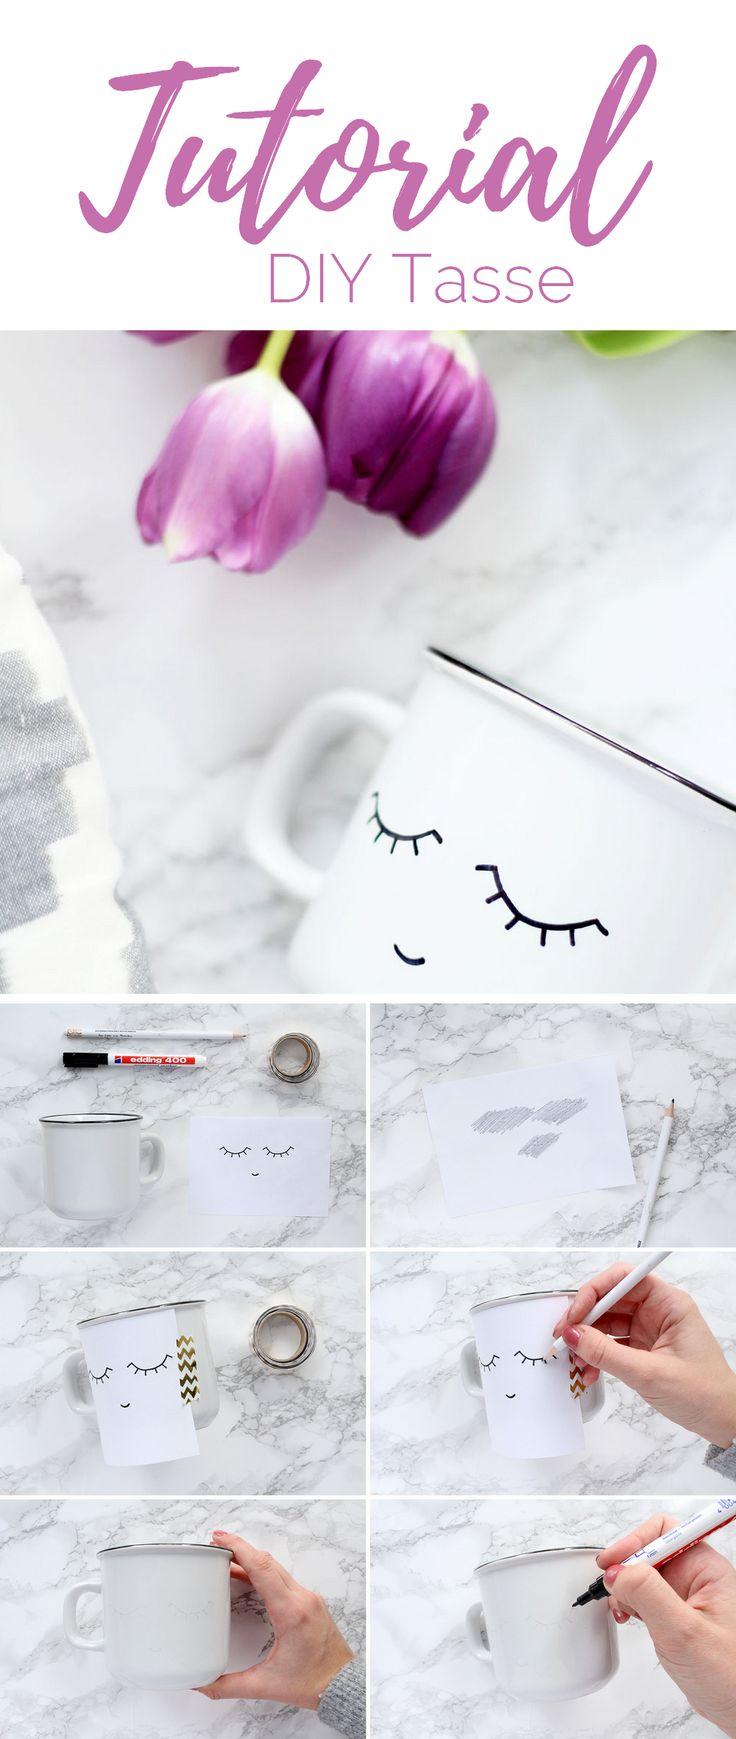 DIY Tasse mit Klimperwimpern